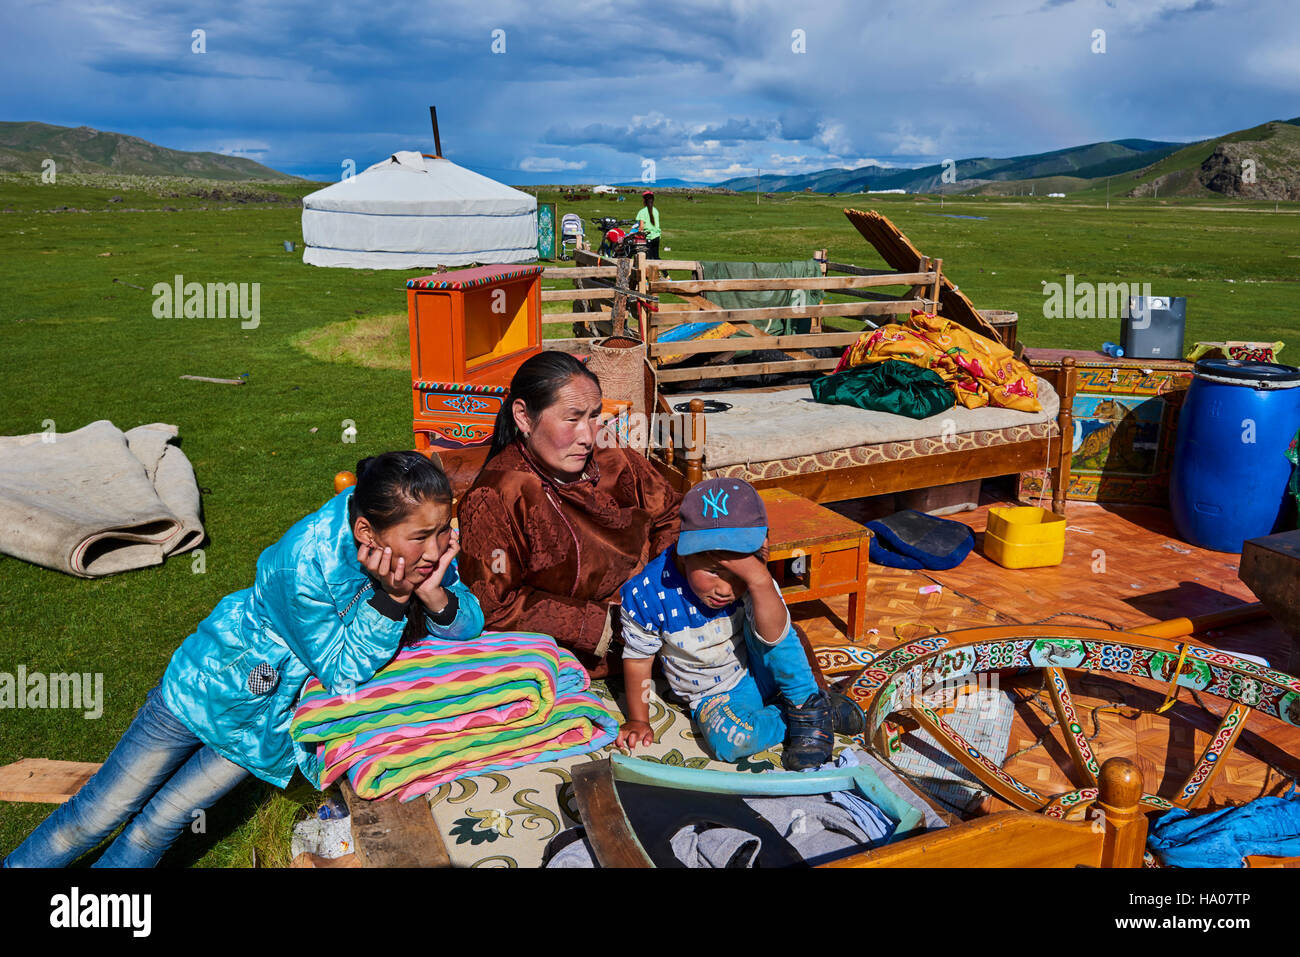 Mongolia, provincia, valle de Okhon Ovorkhangai, Campamento nómada en la migración Imagen De Stock